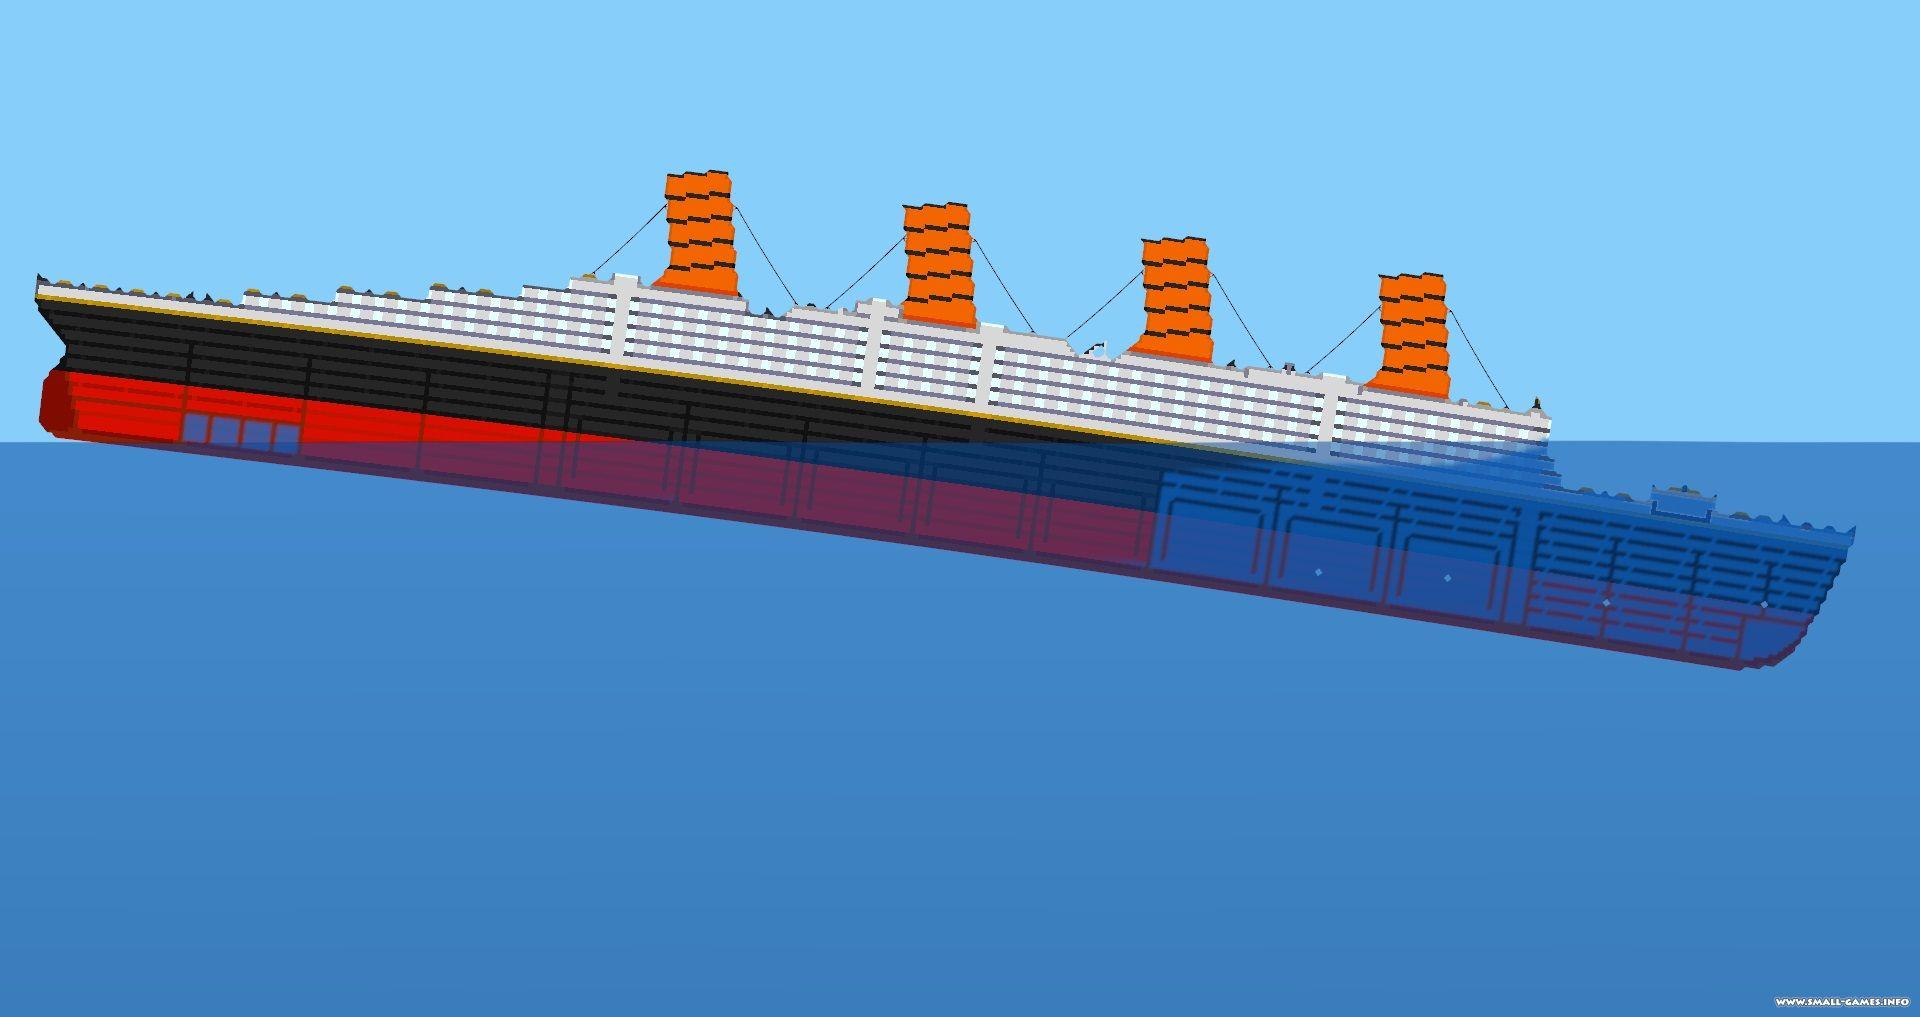 Sinking simulator 2 v2. 0. 2 / sinking ship simulator торрент.